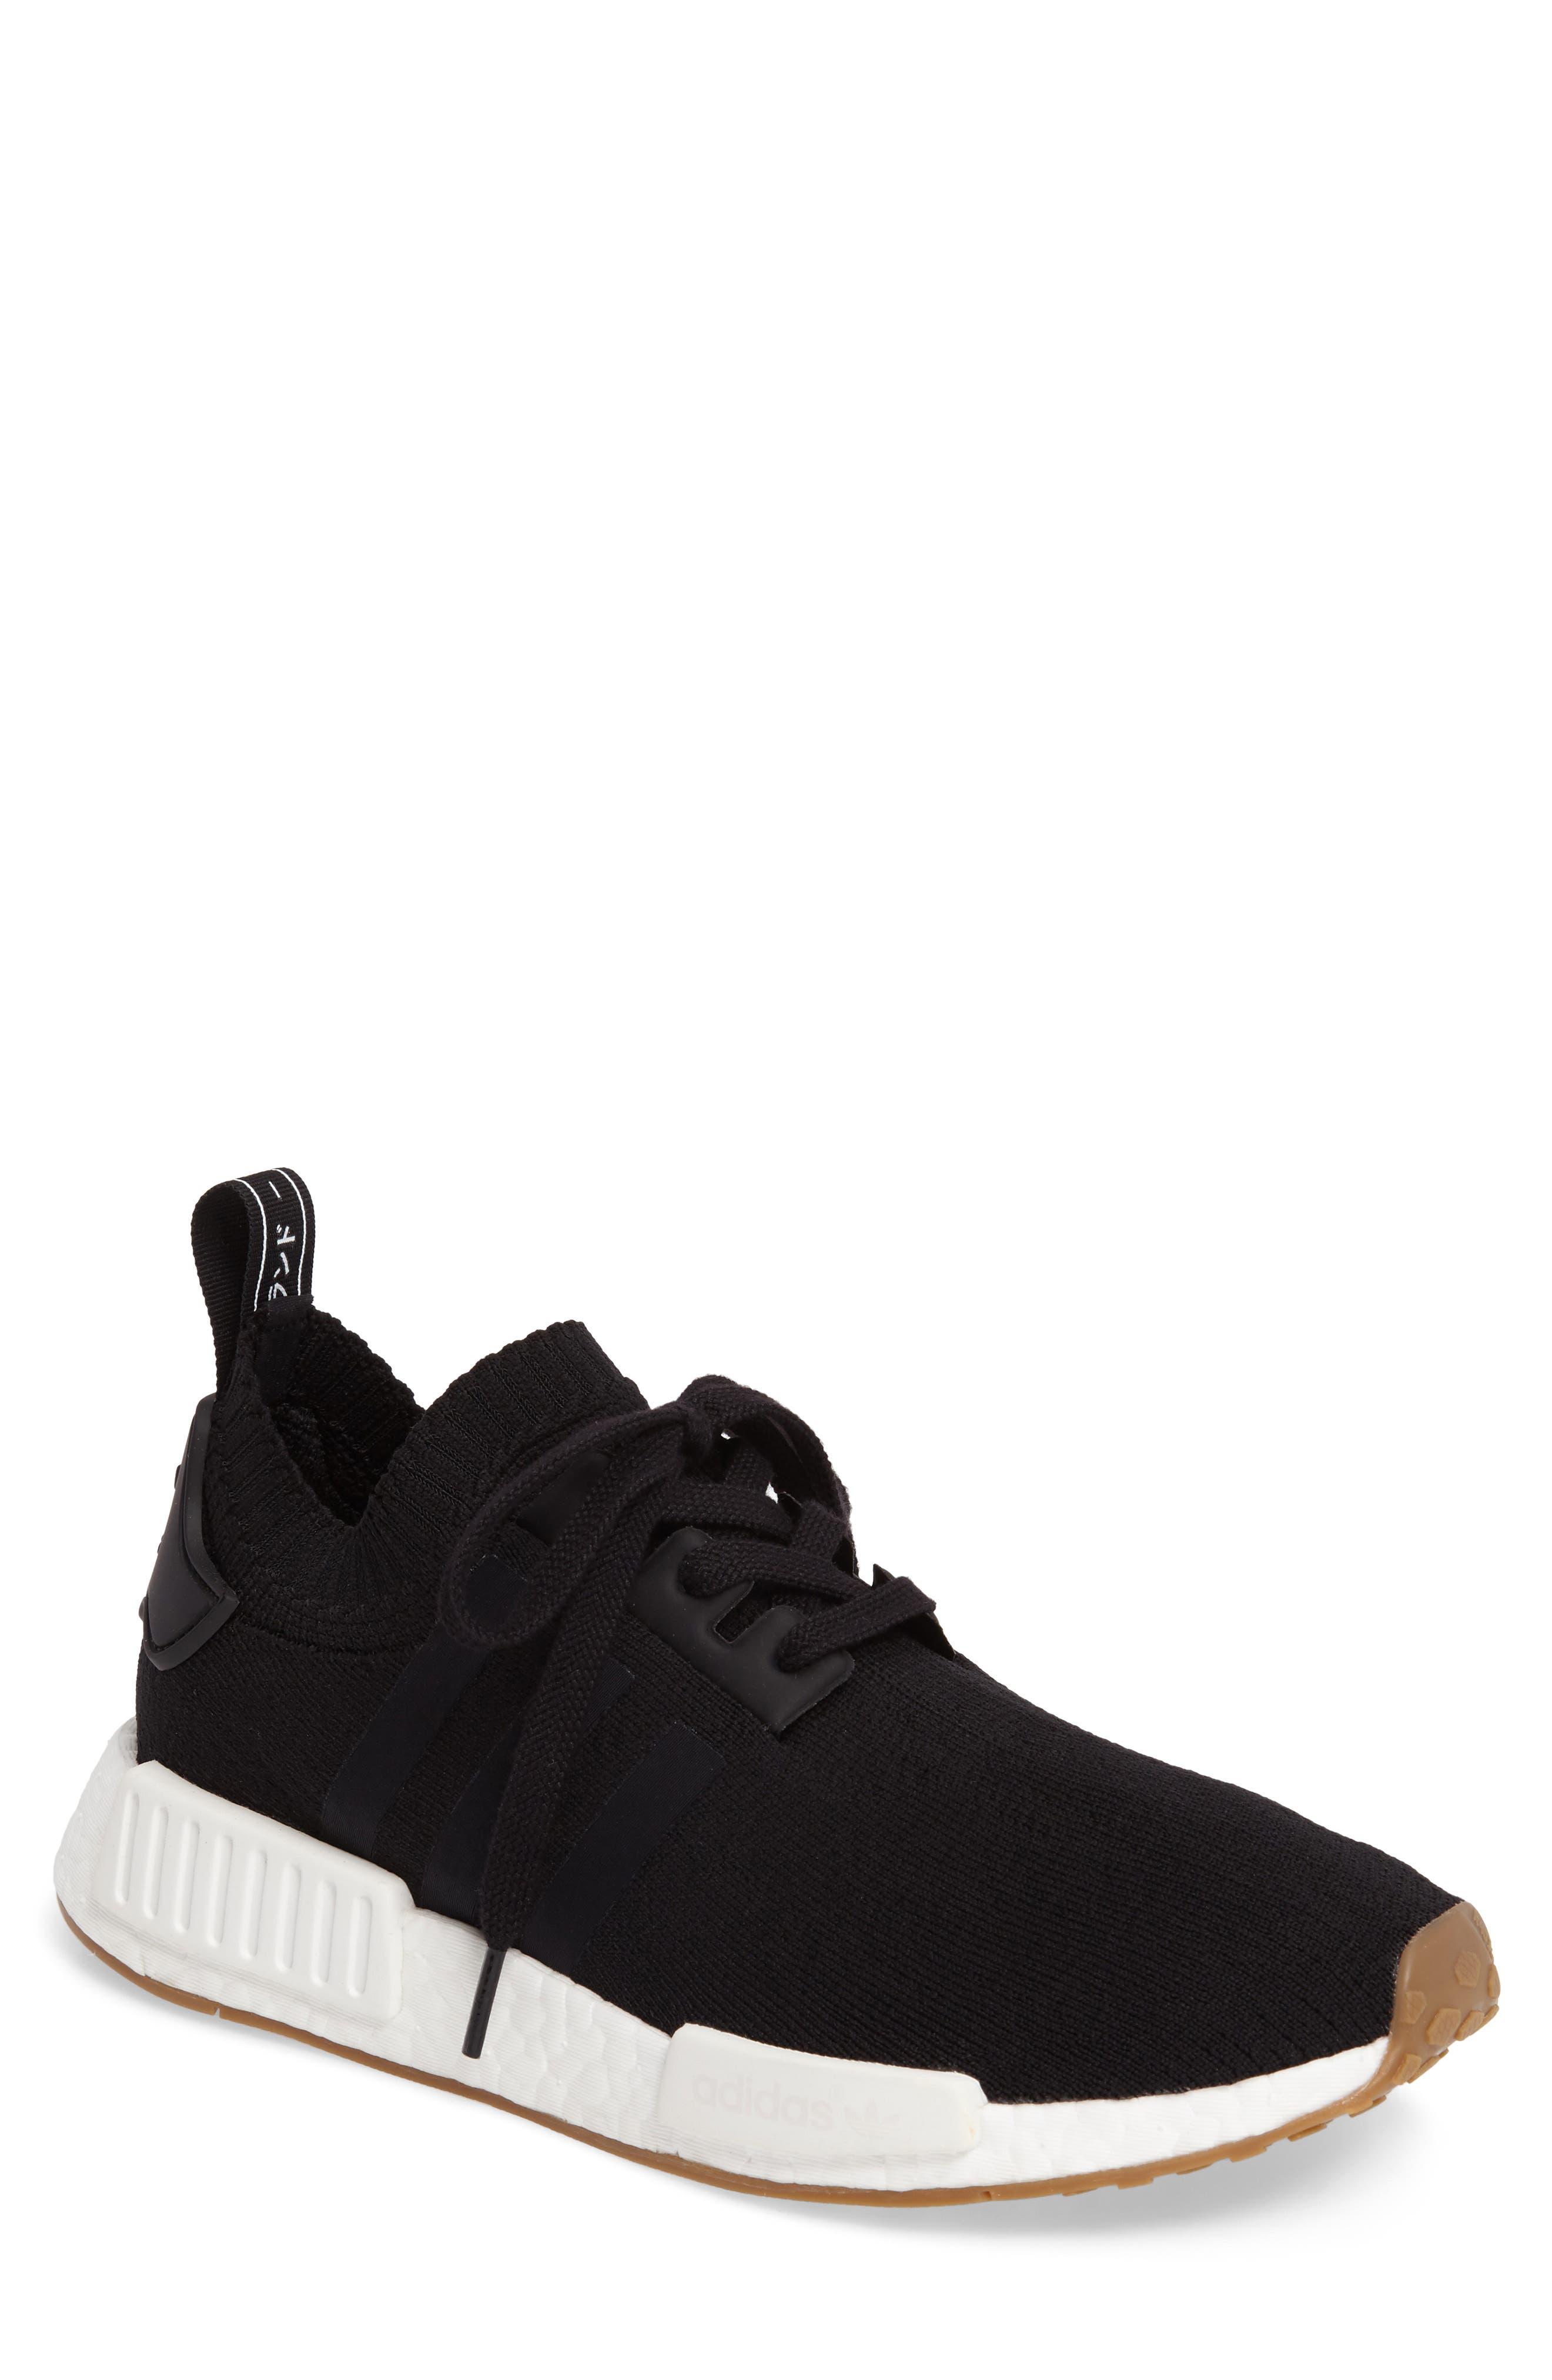 NMD R1 Primeknit Sneaker,                         Main,                         color, 002